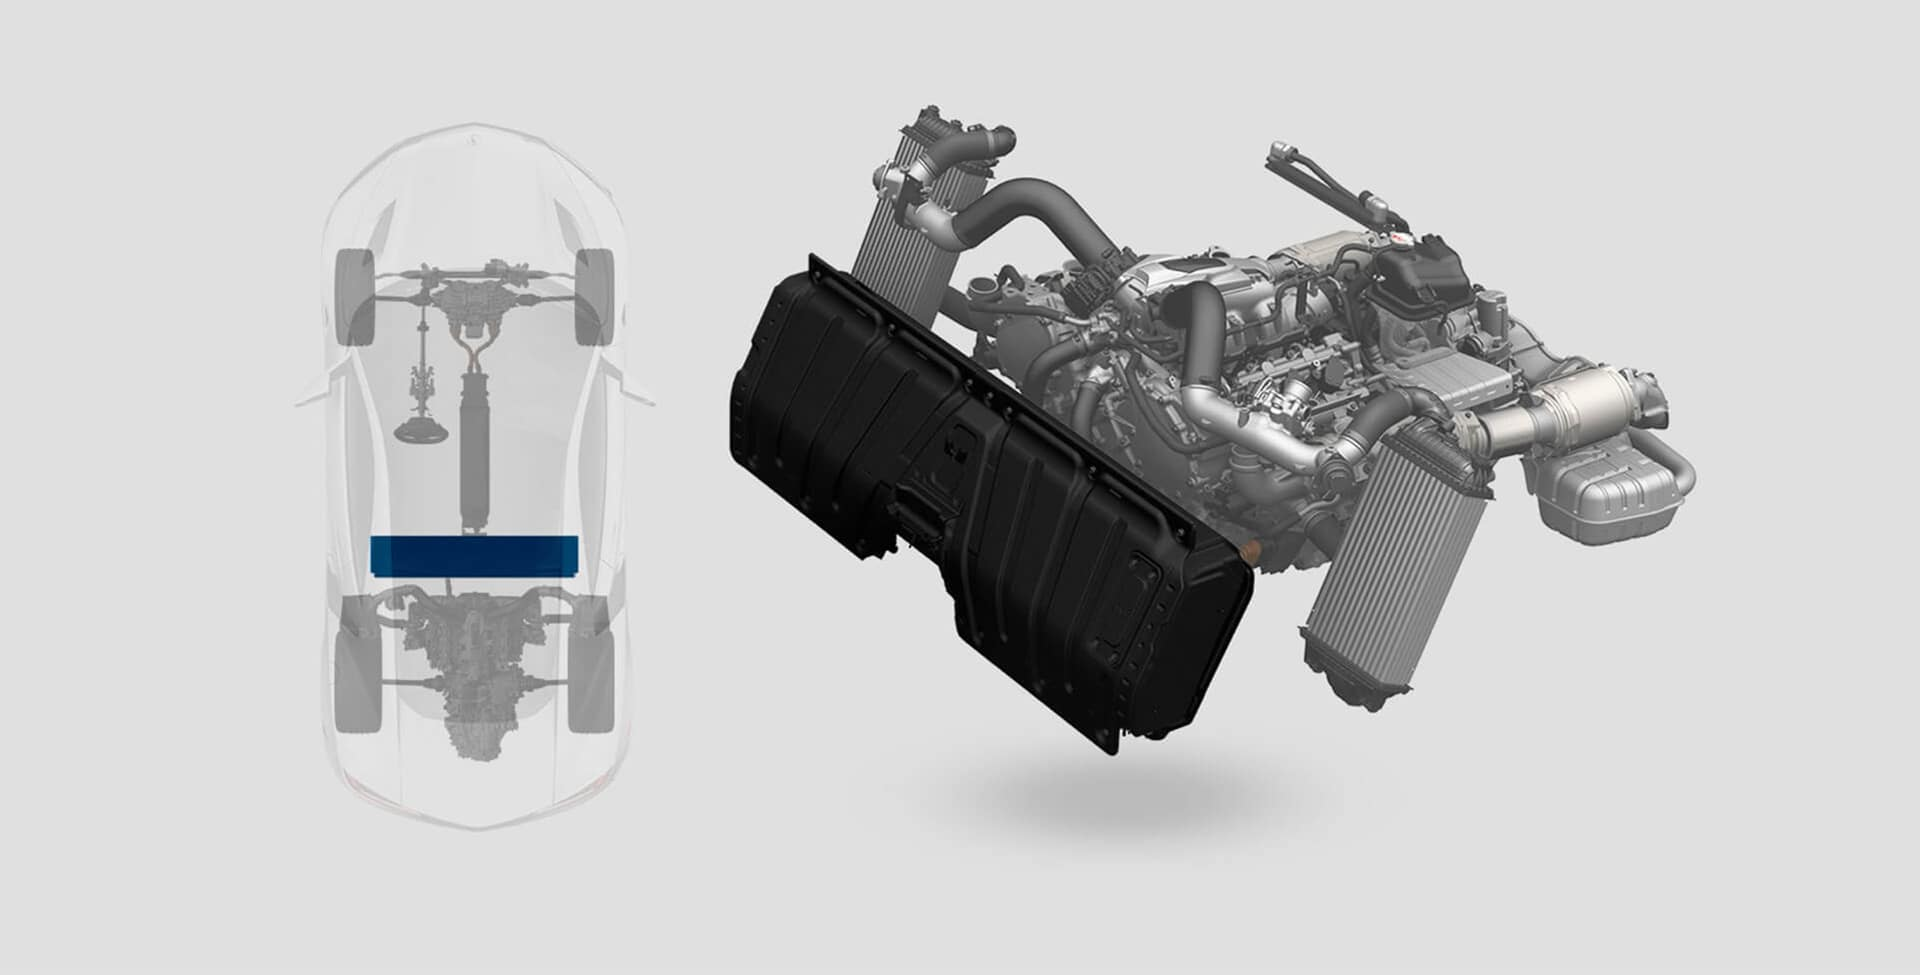 Acura NSX intelligent power unit